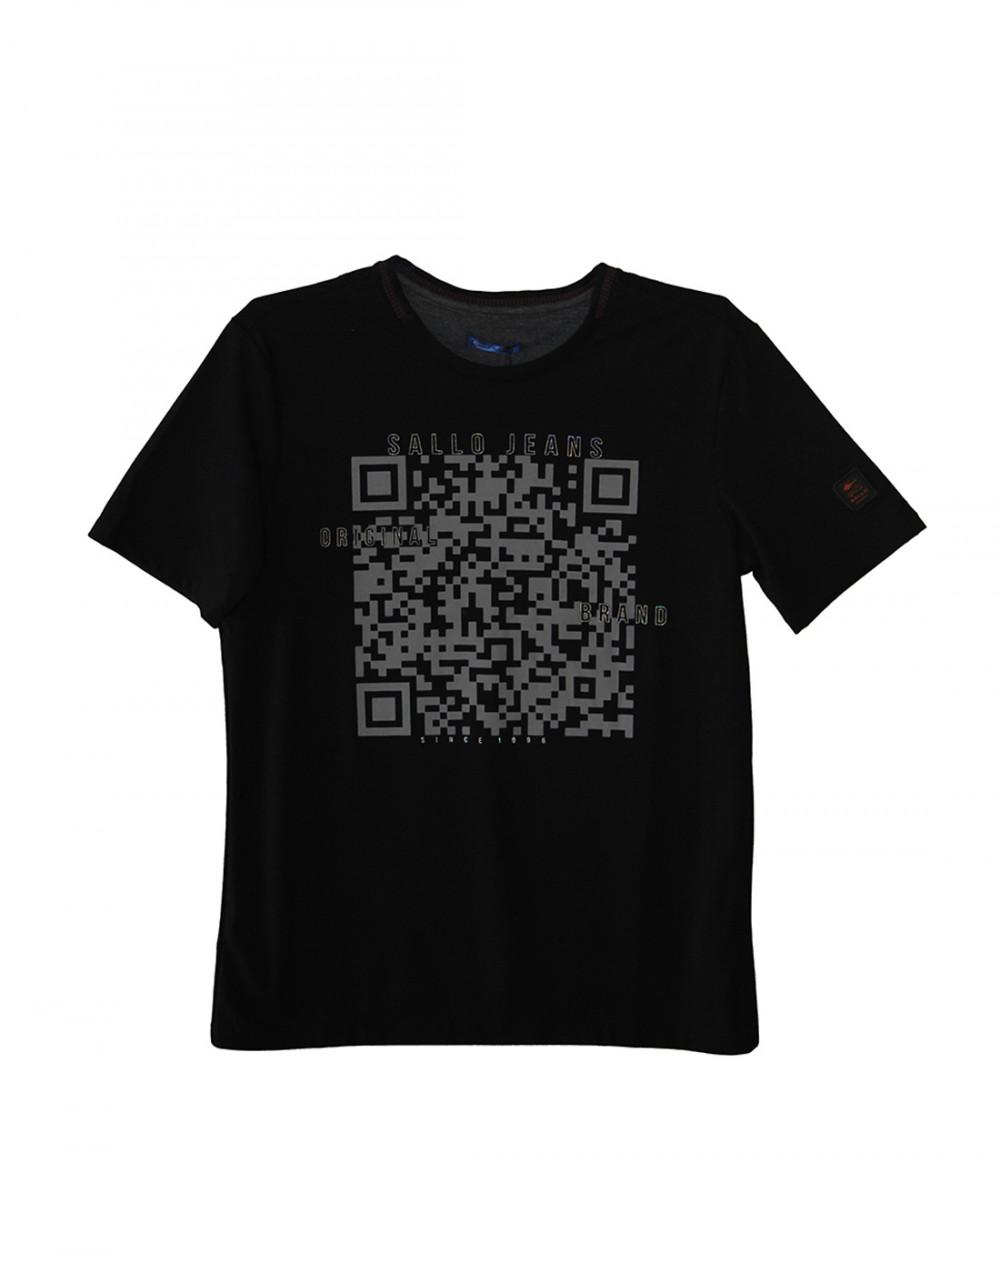 Camiseta Gola O. Estampa QR Code Preto Sallo